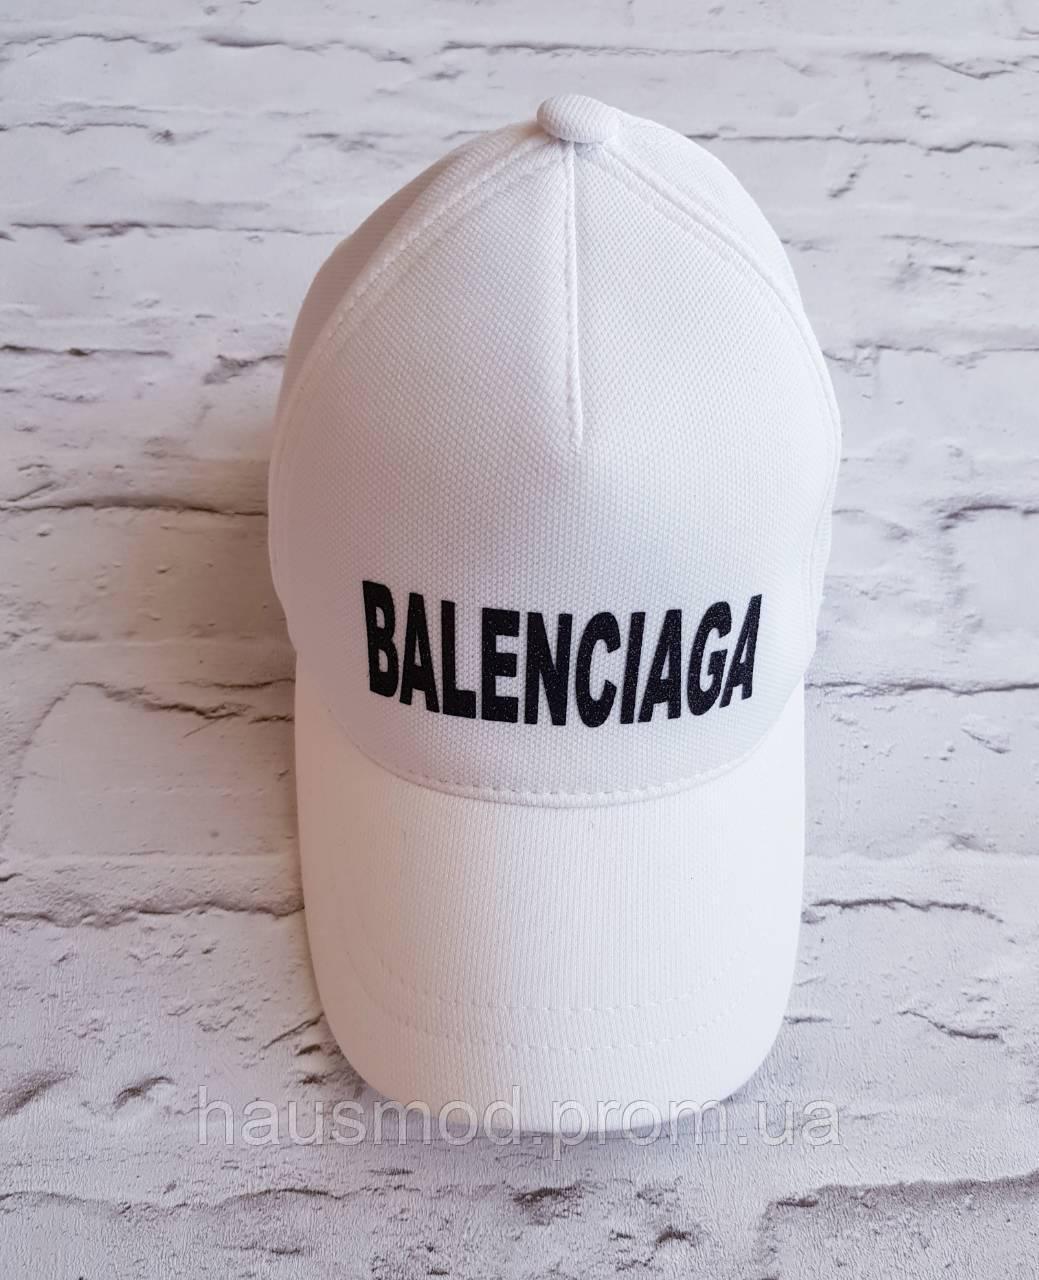 Хит сезона!  новинка женская кепка BALENCIAGA белая опт и розница со склада в одессе